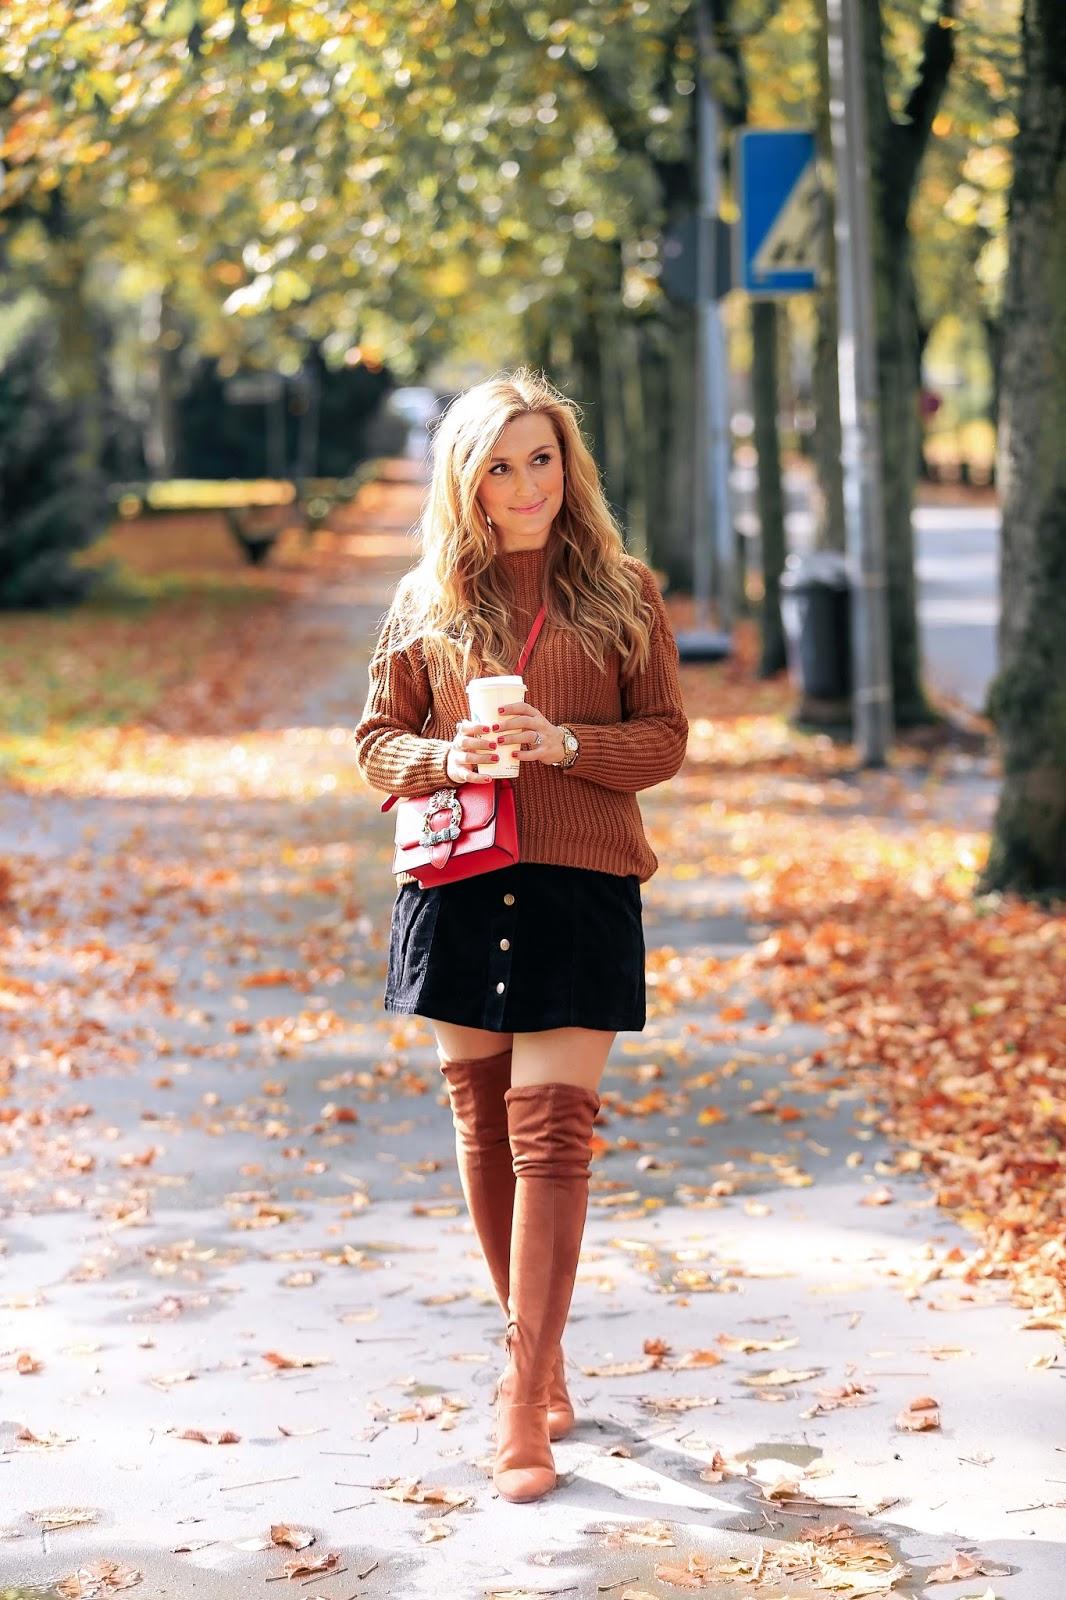 Herbst-trends-cordrock-Fashionstylebyjohanna-overknees-Fashionstylebyjohanna-fashionblog-Frankfurt-blogger-fashionblogger-Deutschland-bloggerdeutschland-lifestyleblog-modeblog-germanblogger-styleblog-cordrock